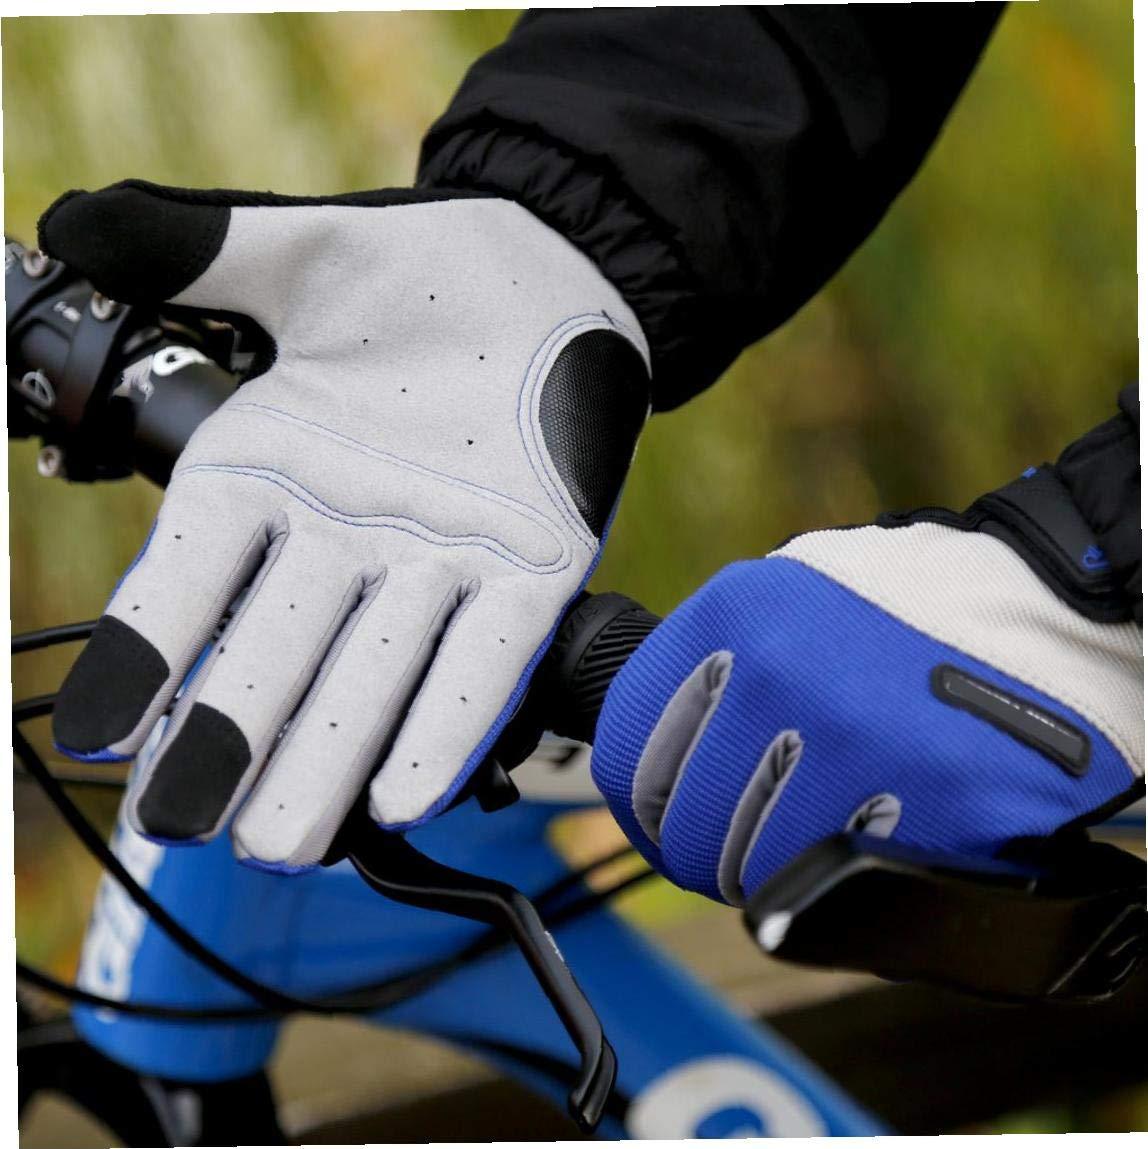 OMMO LEBEINDR Guantes Unisex Ciclismo Universal Bike Guantes Anti Guantes De Compresi/ón para Bicicletas En L 1 Par Bluecompression Transpirable Riding